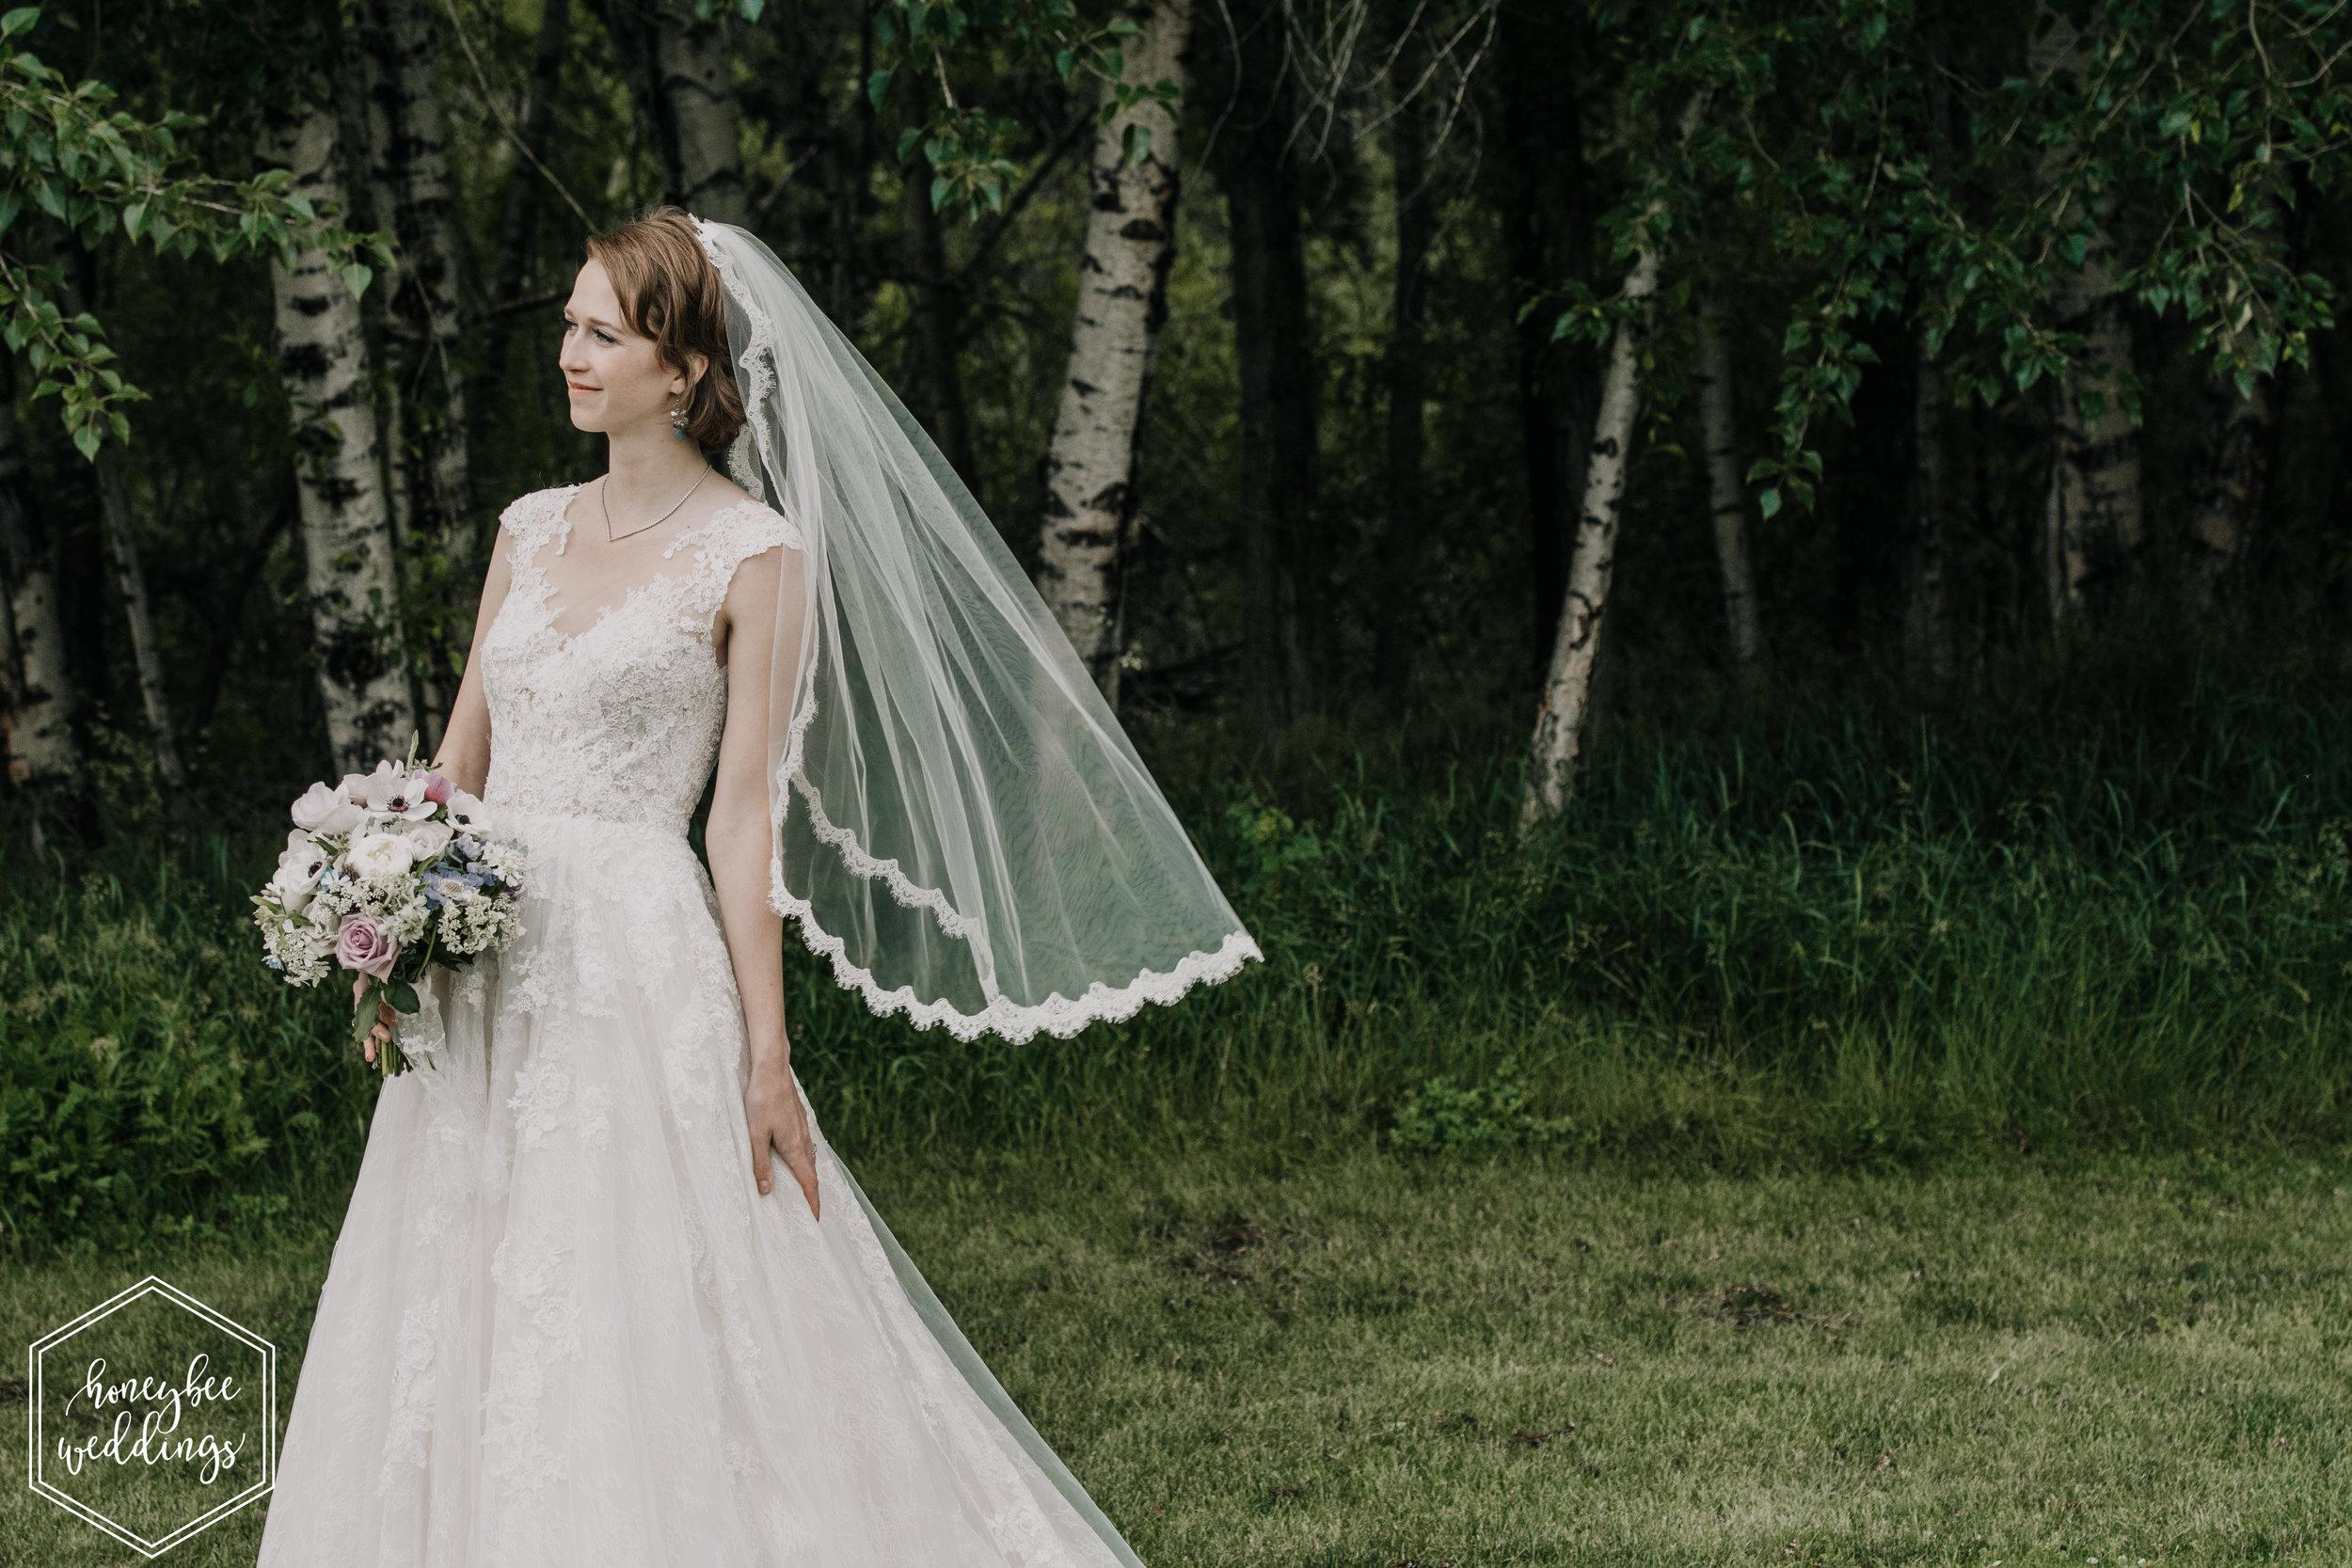 726 Riverside Country Club Wedding_Montana Wedding Photographer_Lauren Jackson + Evan Ivaldi 2018-7046-2.jpg